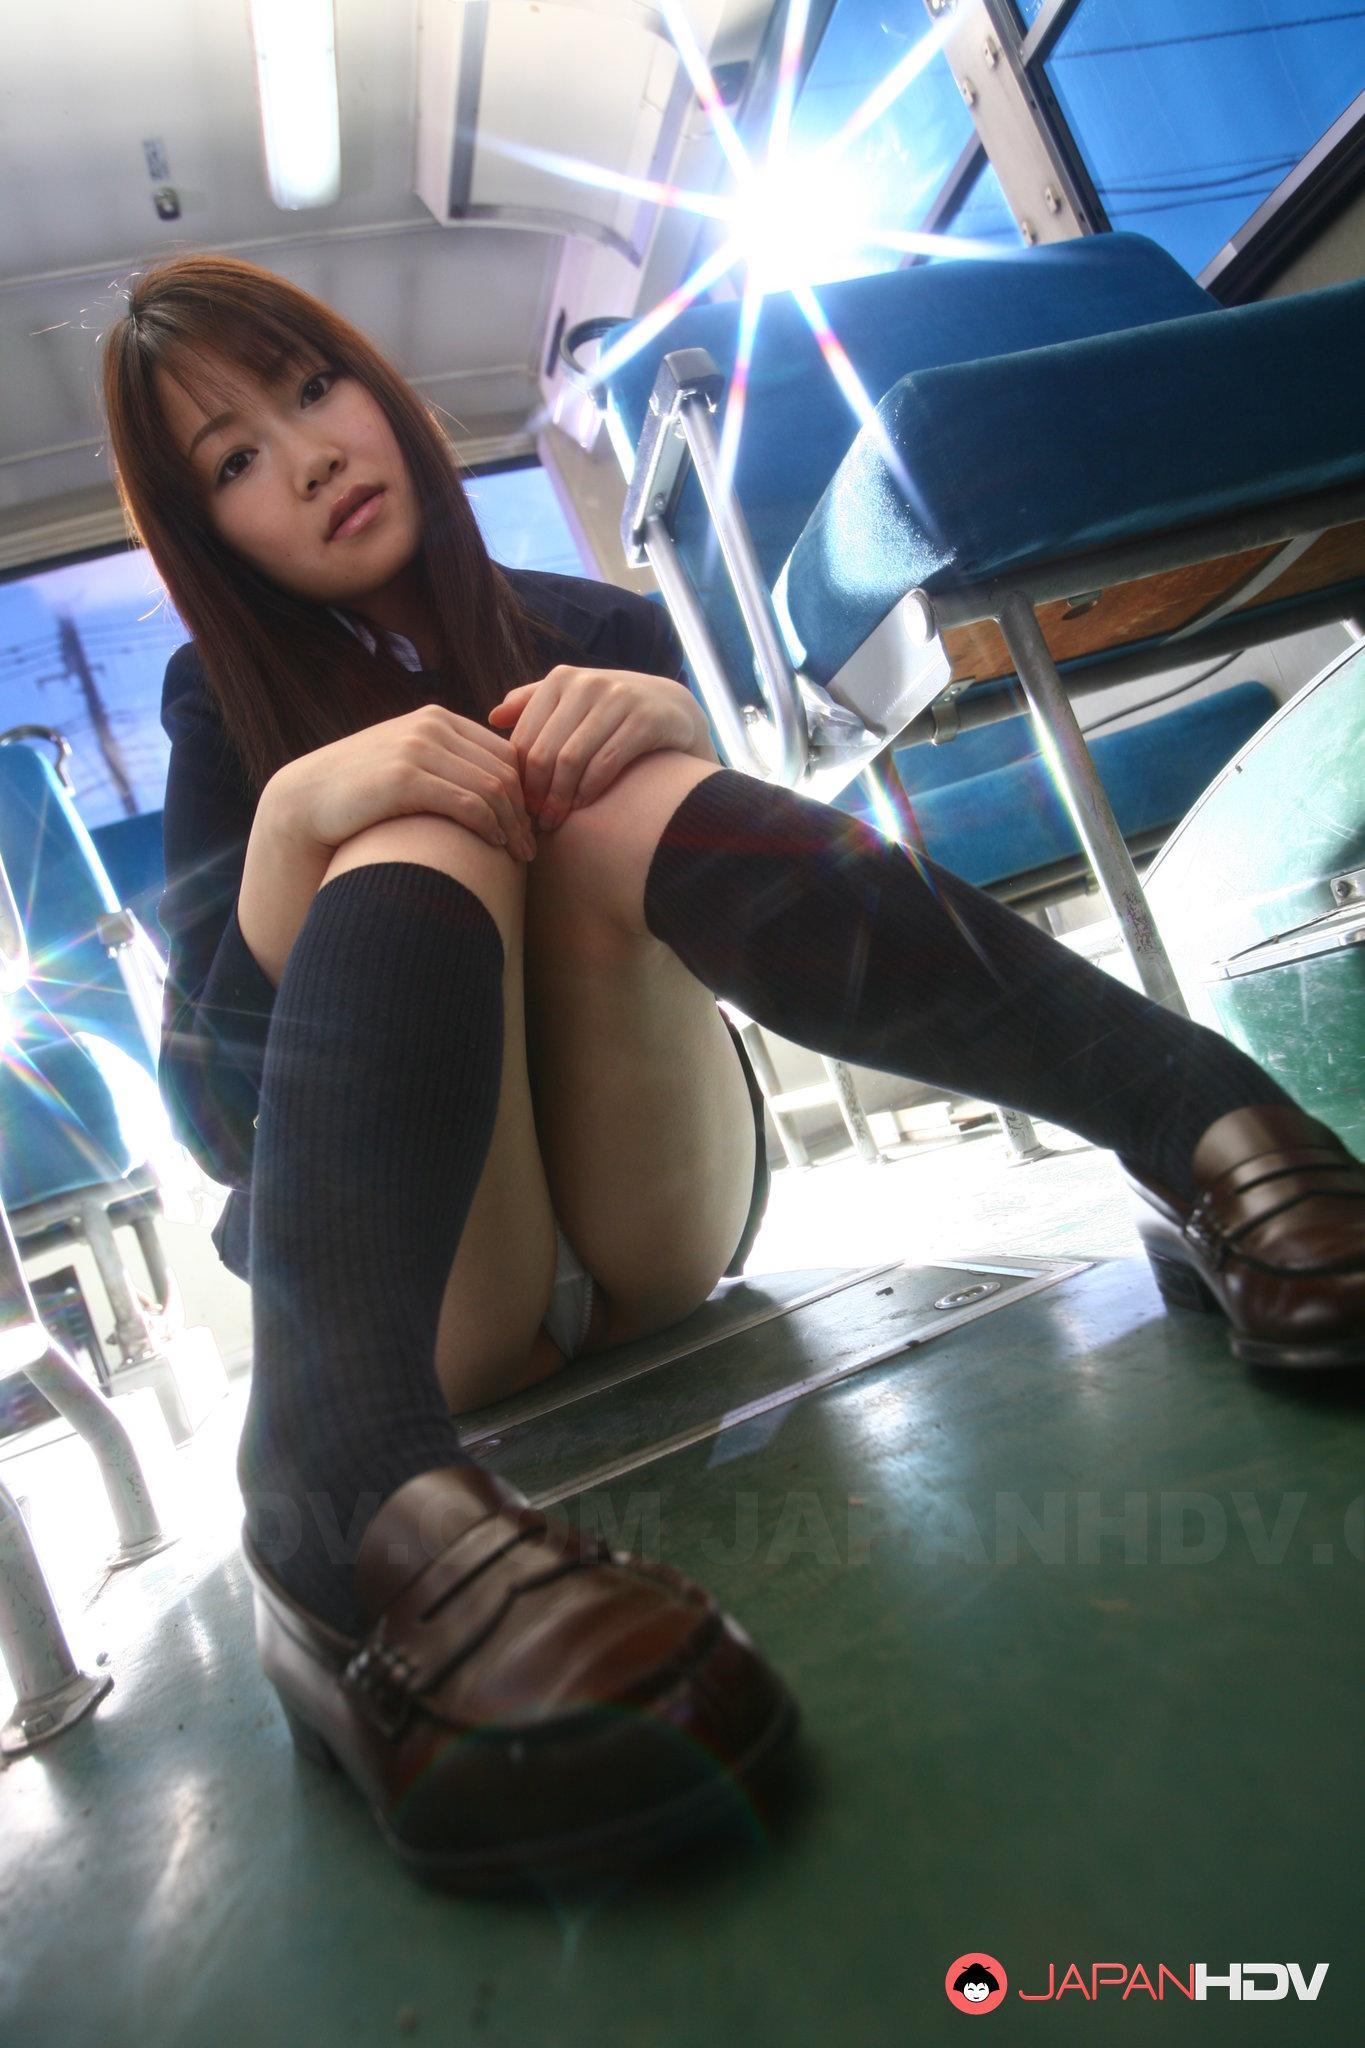 Japanese schoolgirl bus